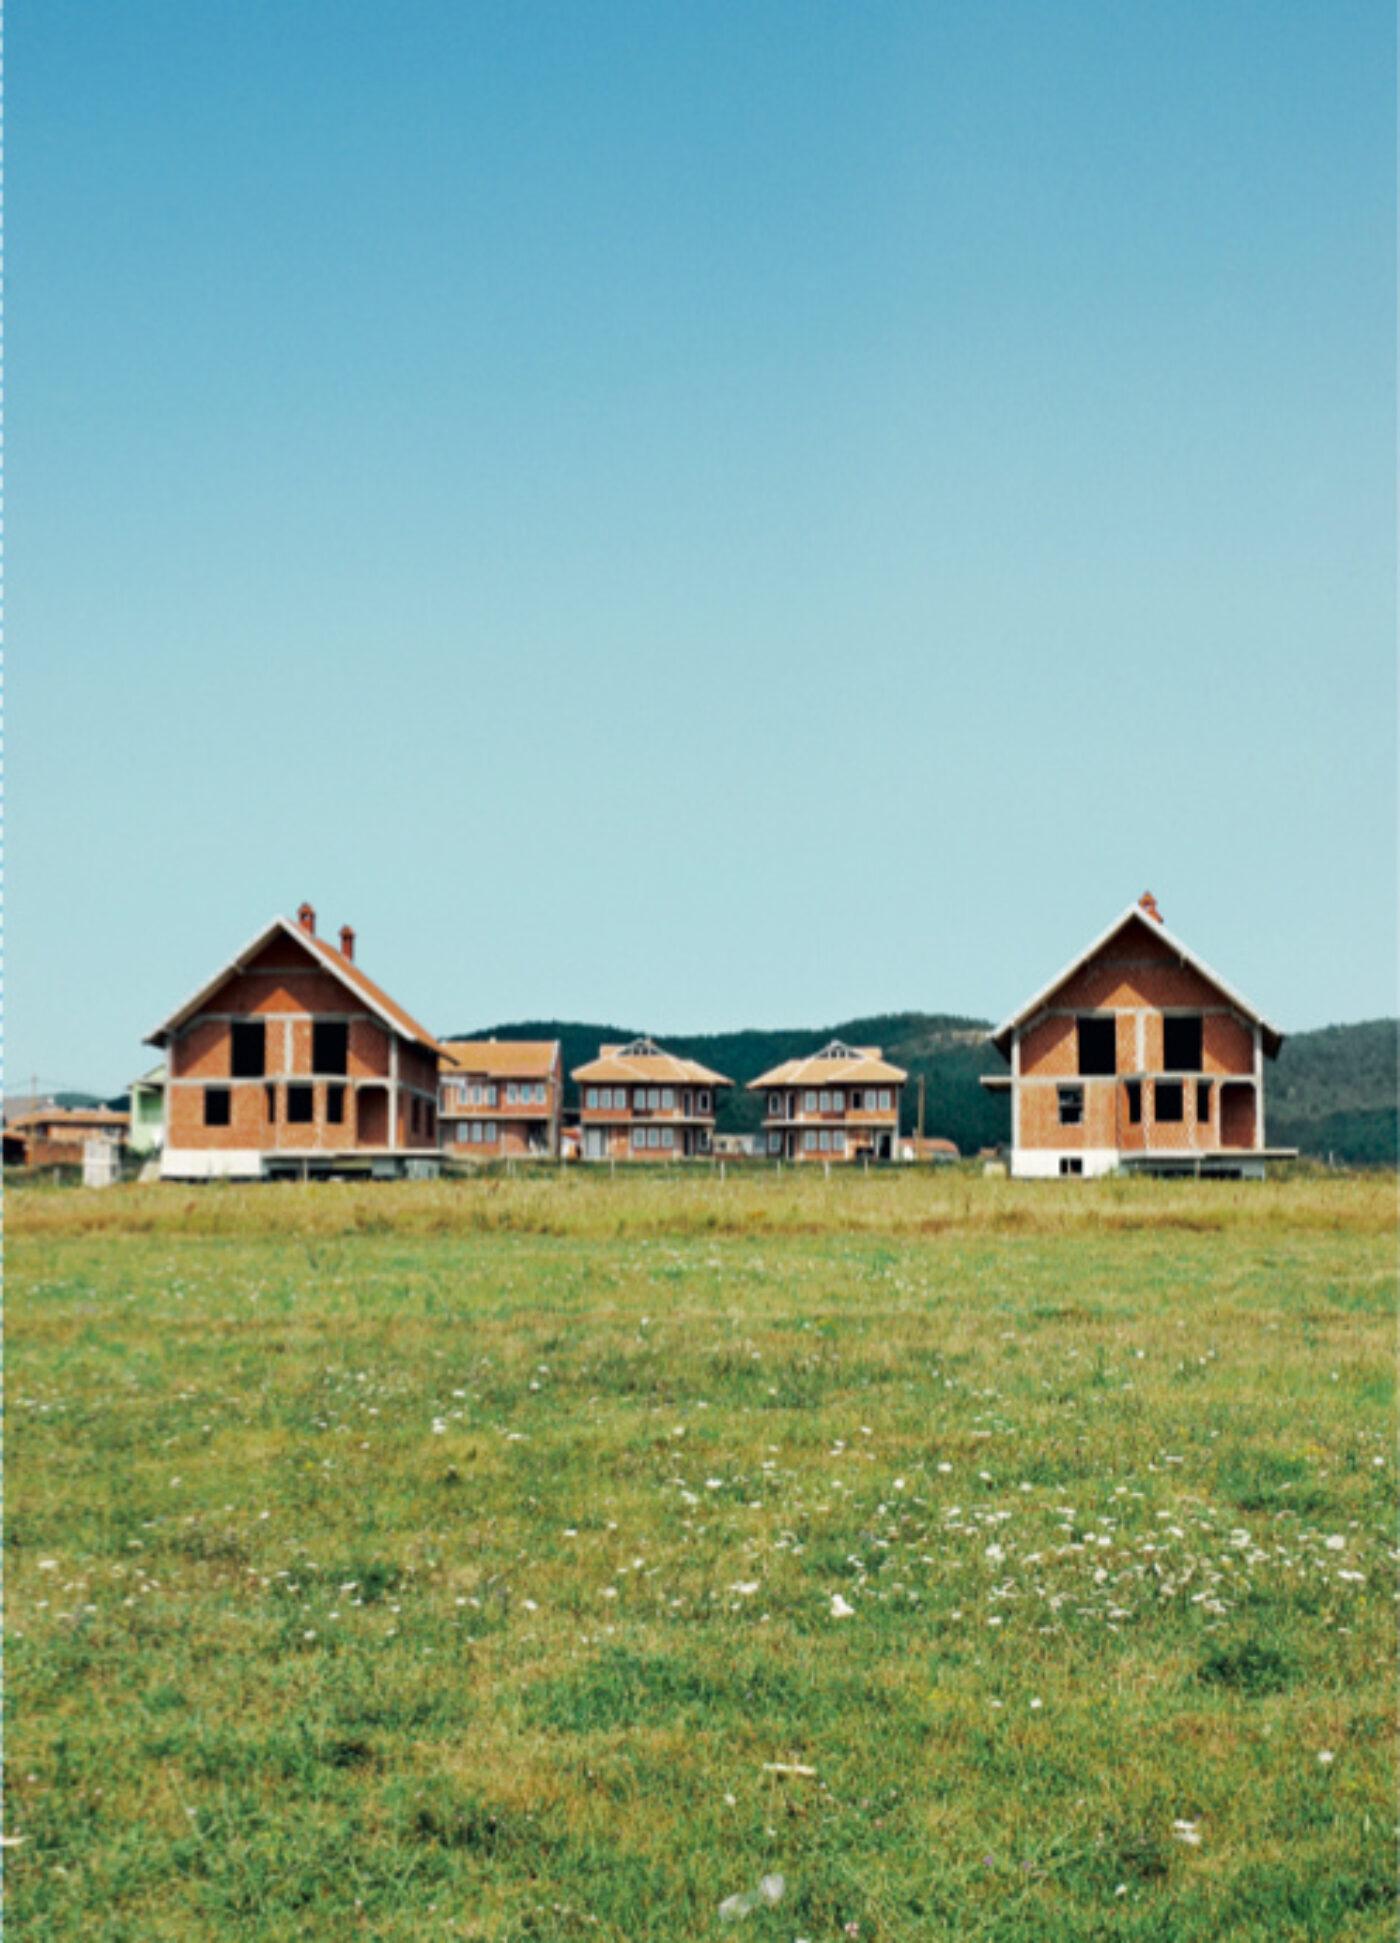 KOSOVO: Prishtina Building Regulations